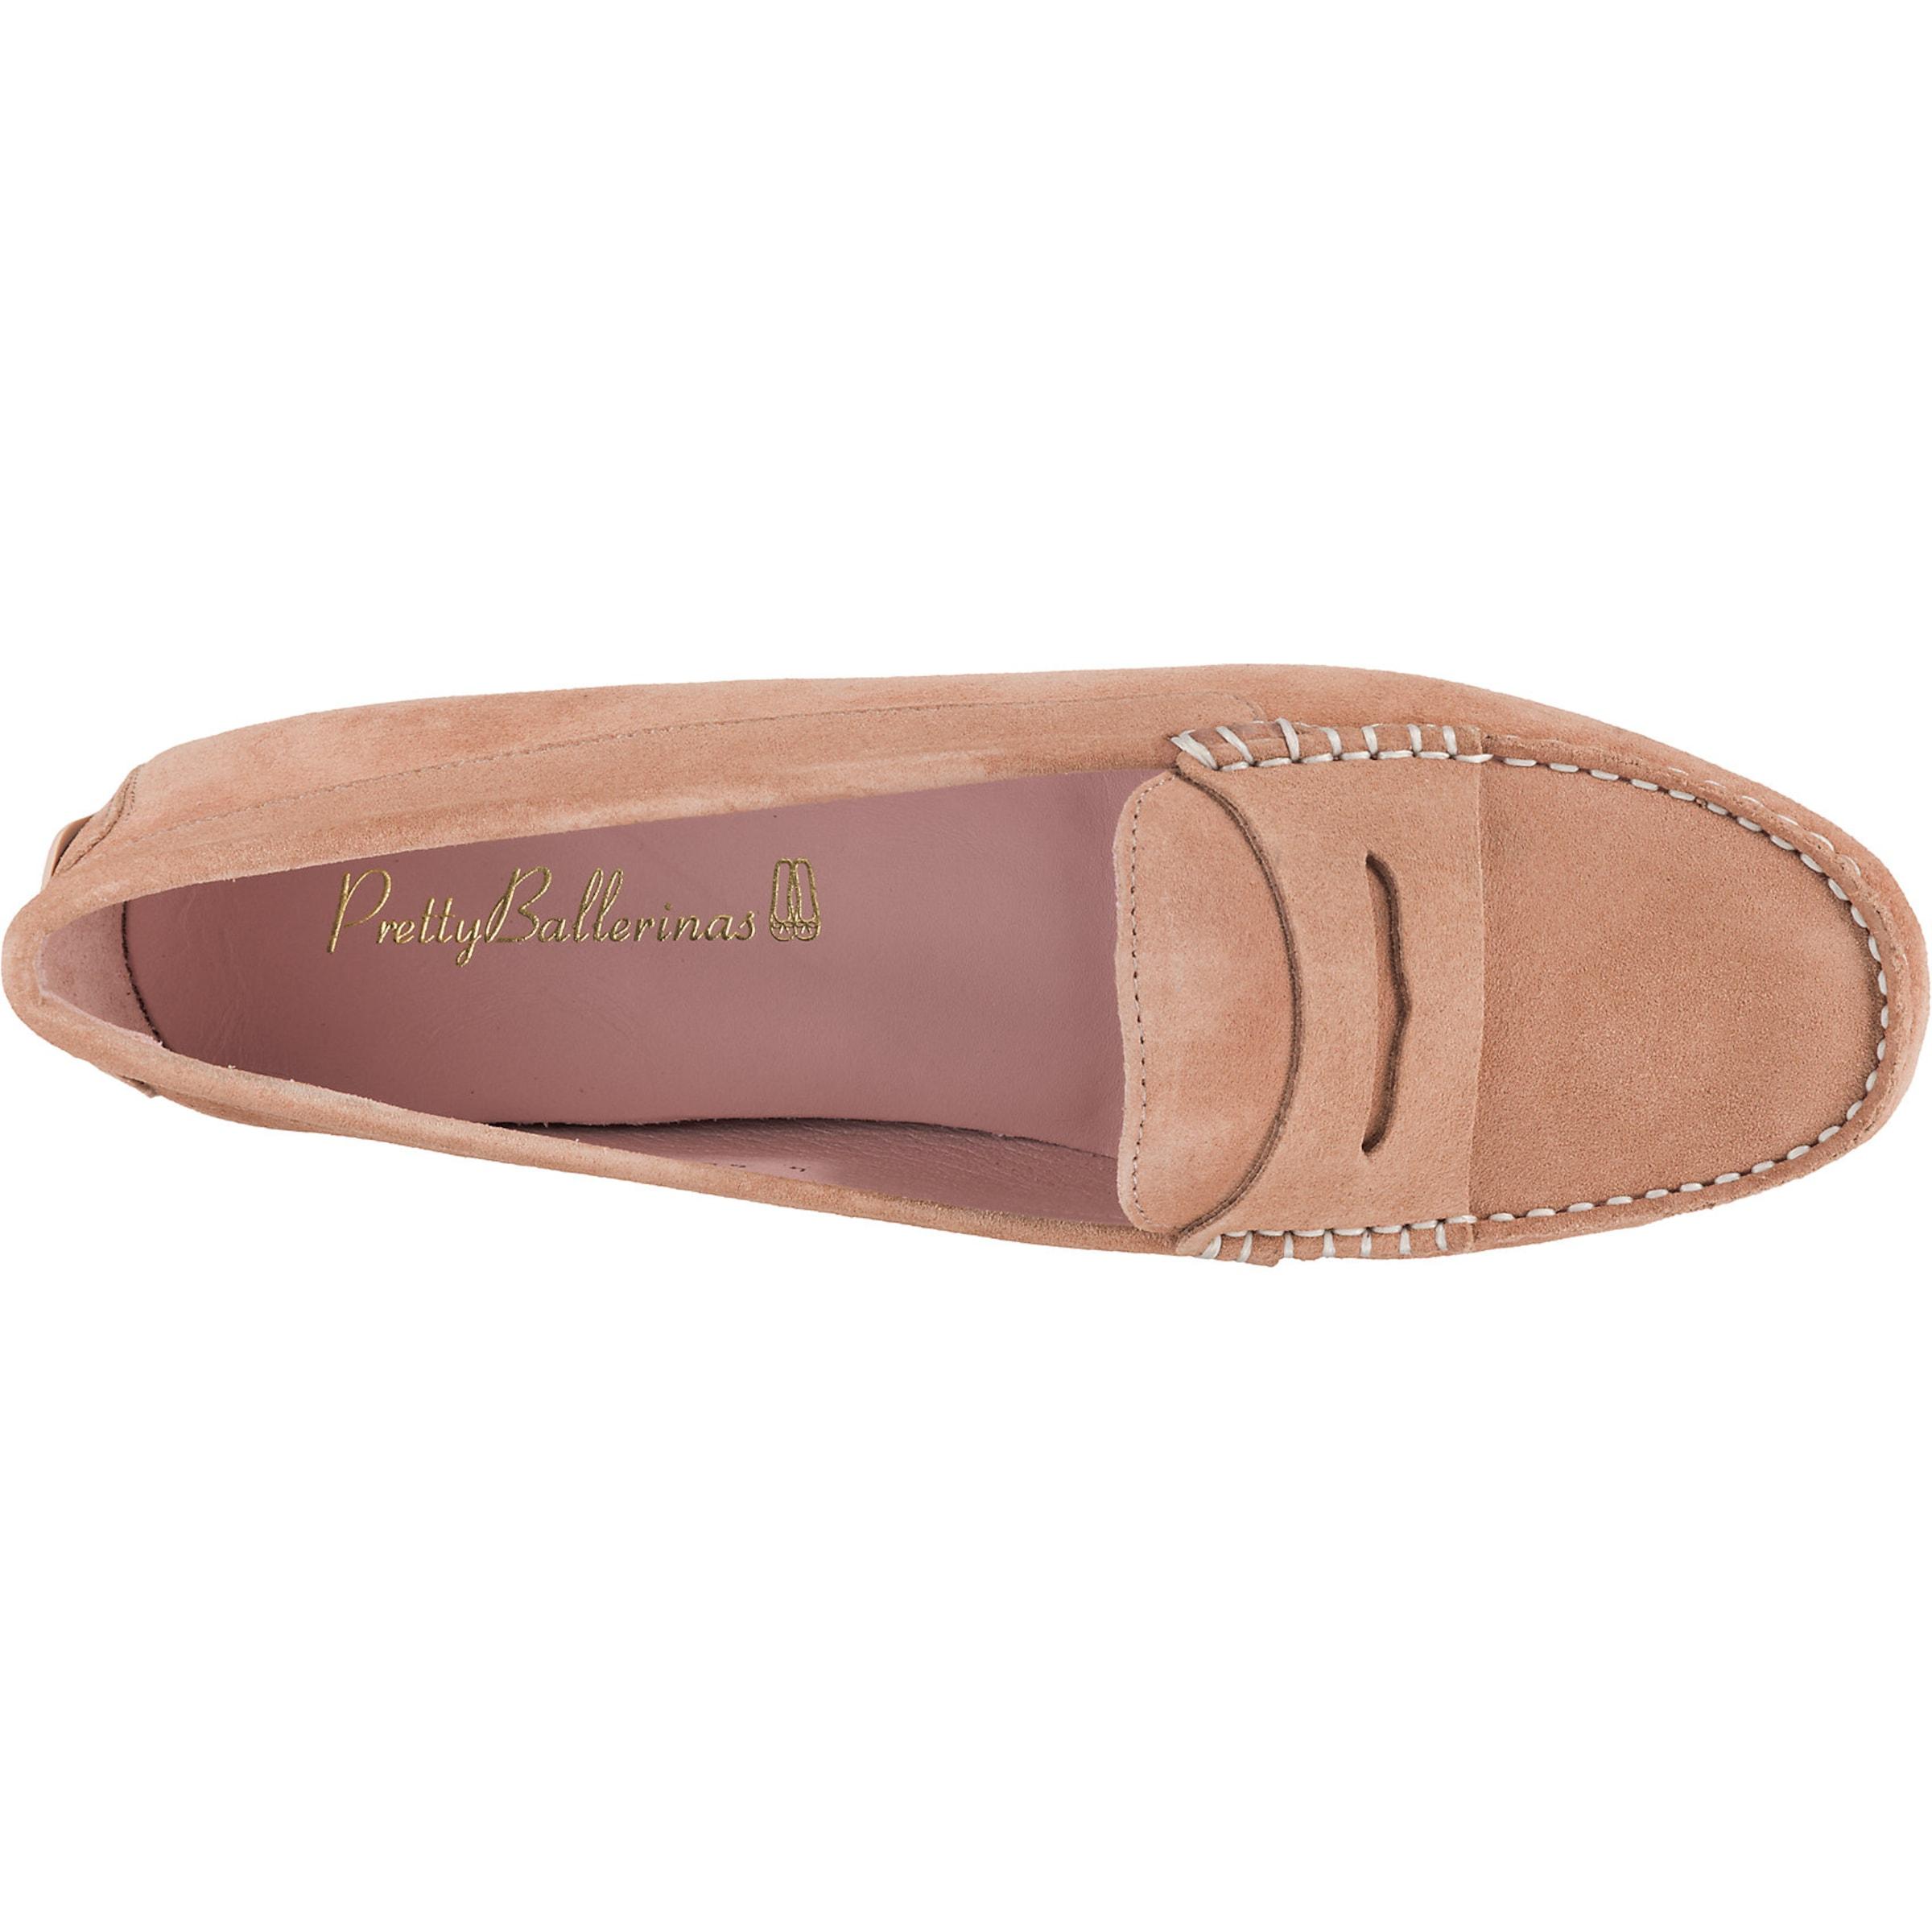 In Pretty Pretty Loafers Ballerinas Hellbraun NXOPnk08w